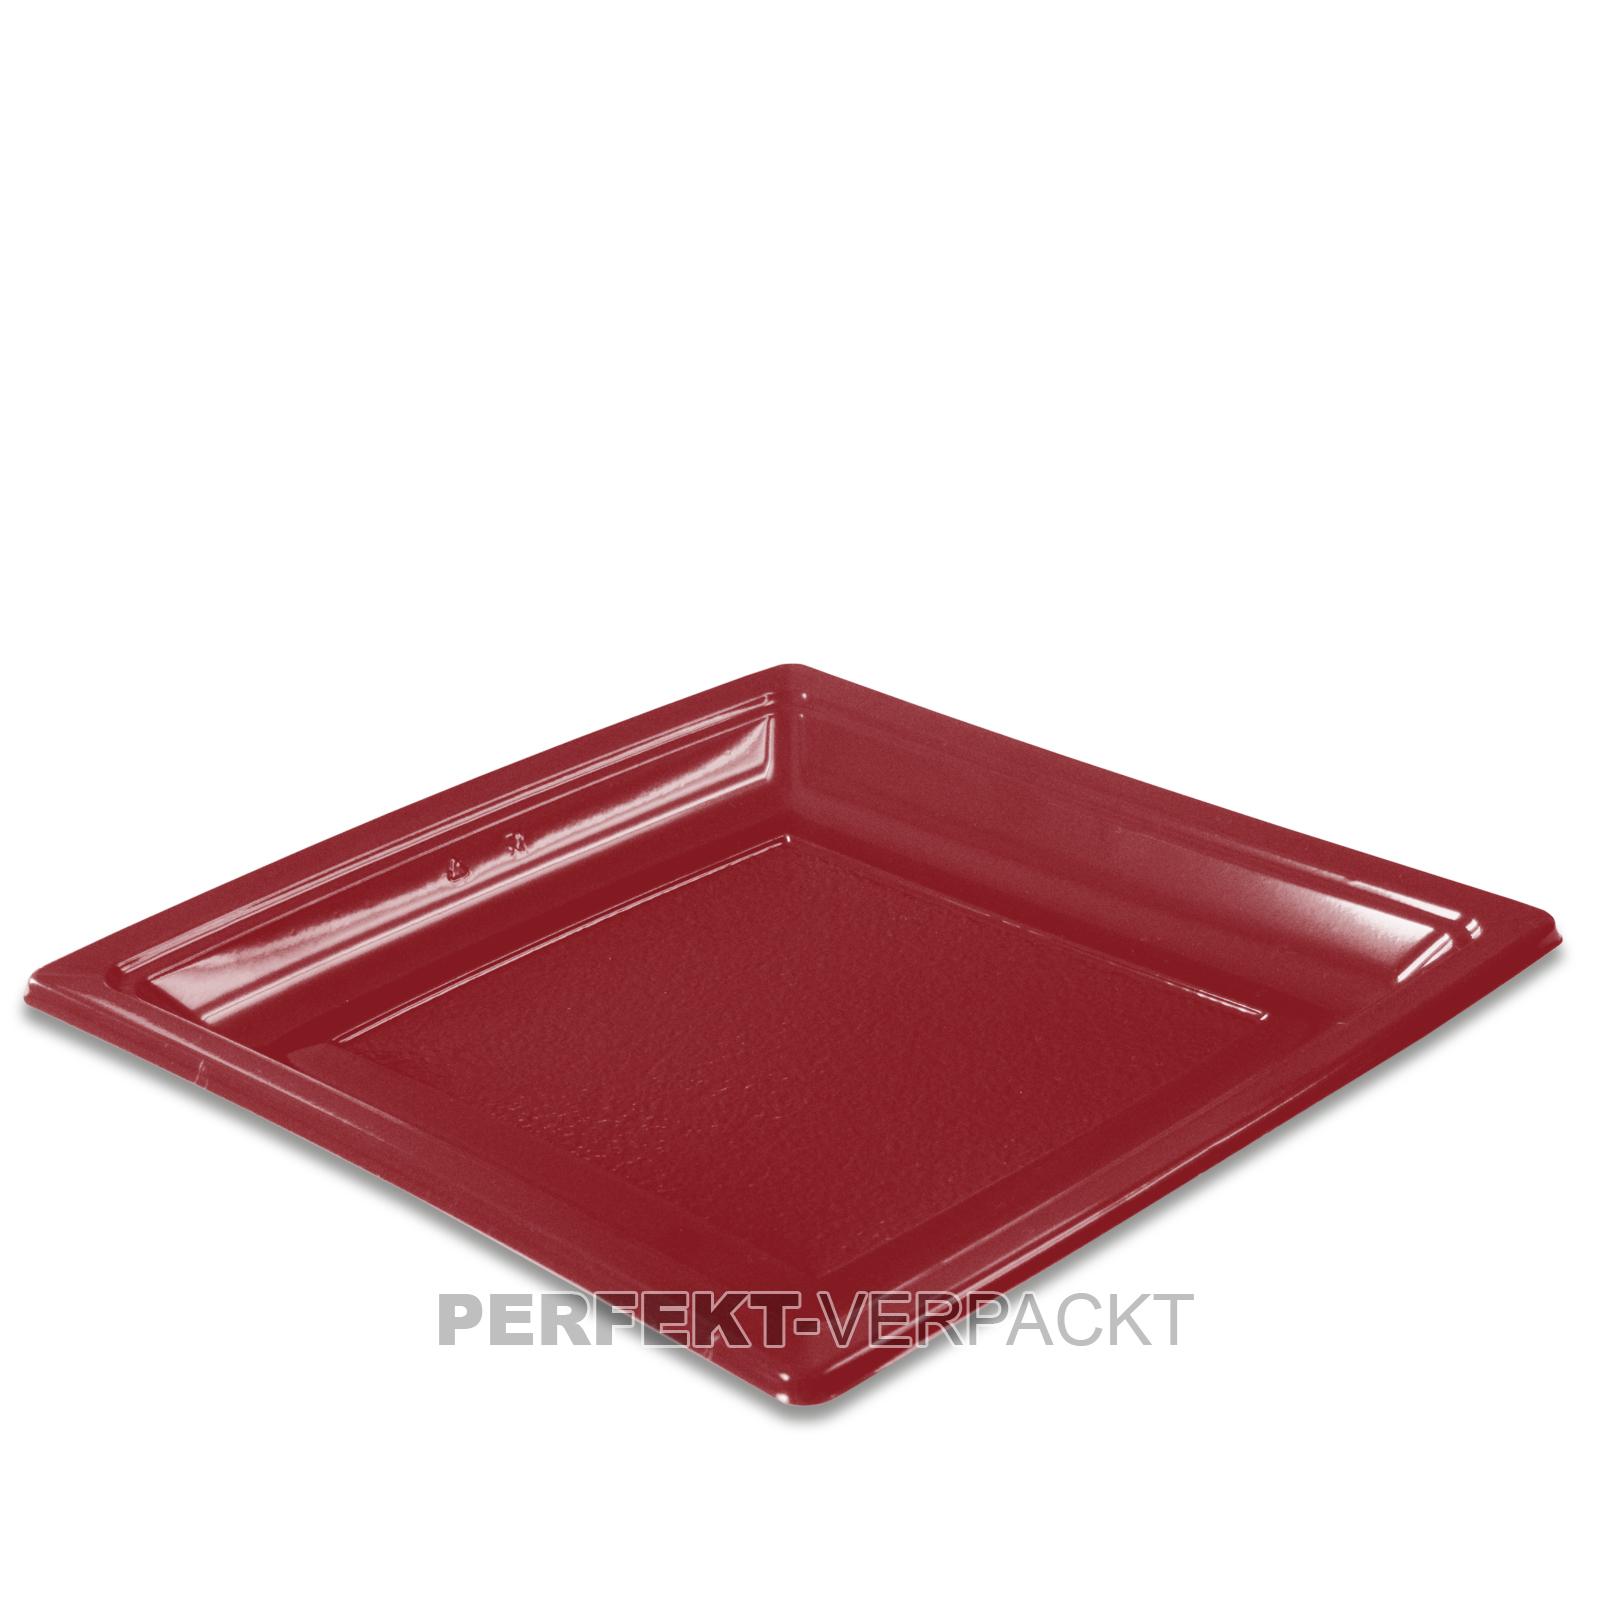 400 Teller quadratisch 18,4x18,4cm BURGUNDERROT aus PS